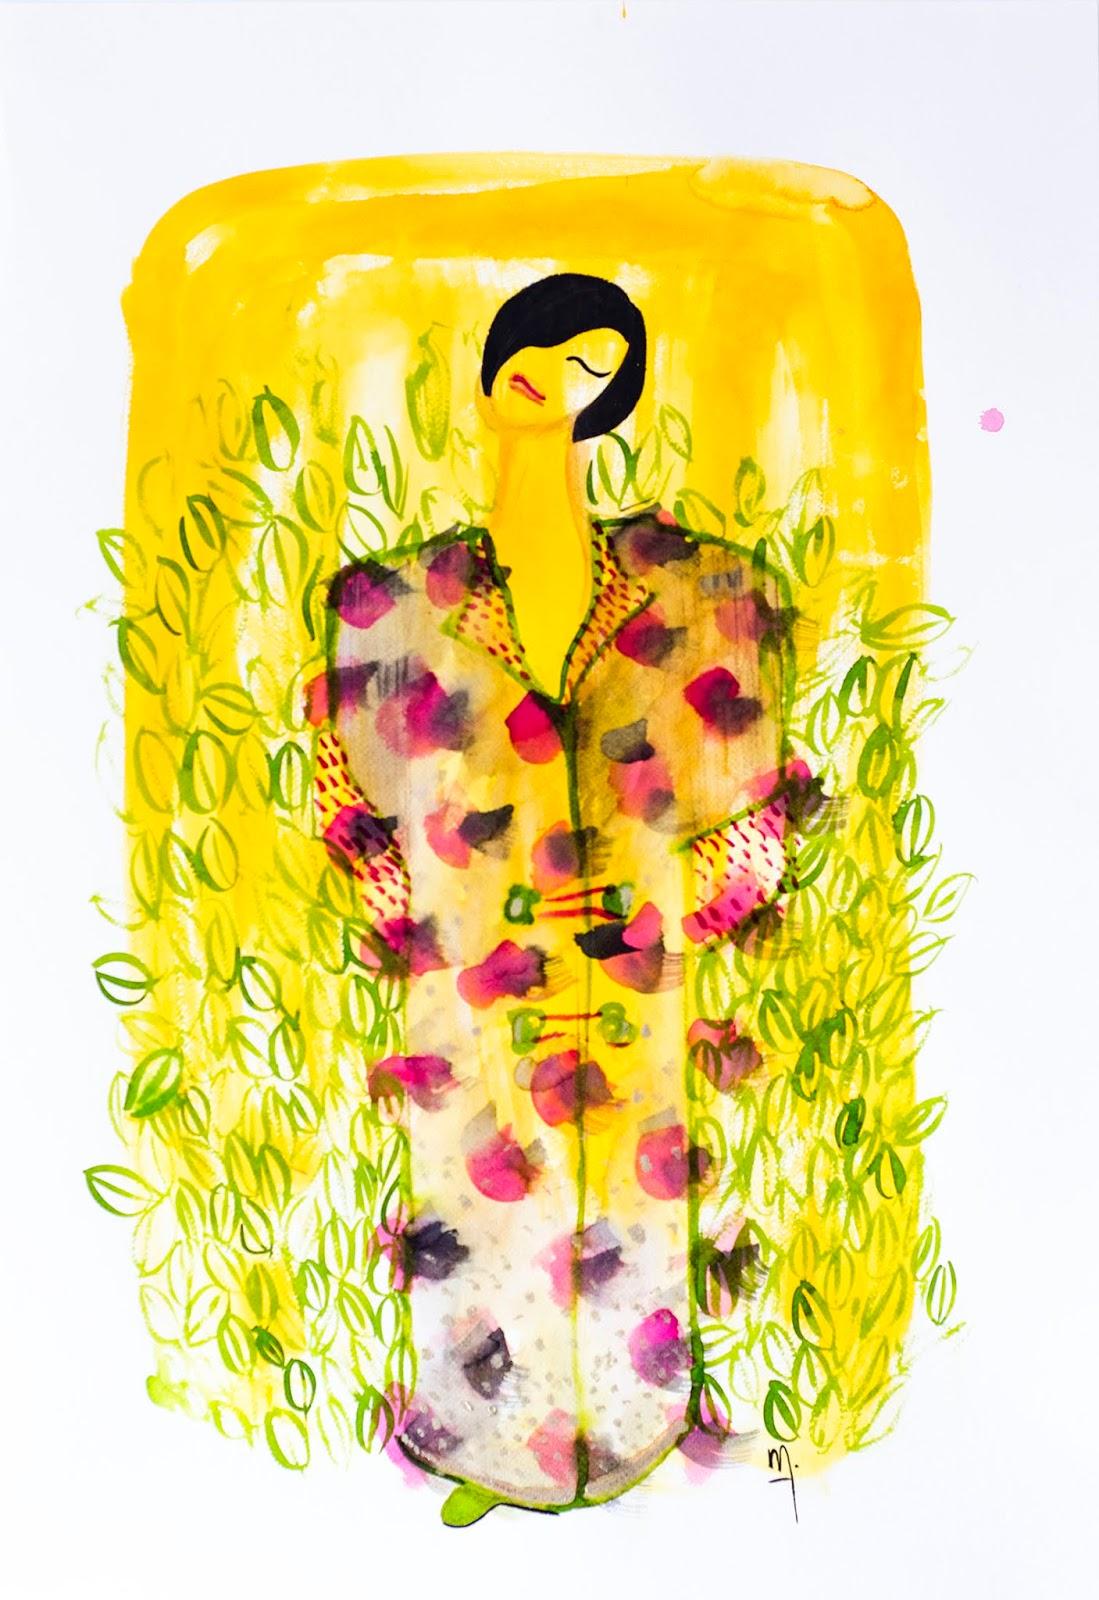 Ilustración de Melina Rapimán mujer con kimono floral en fondo amarillo